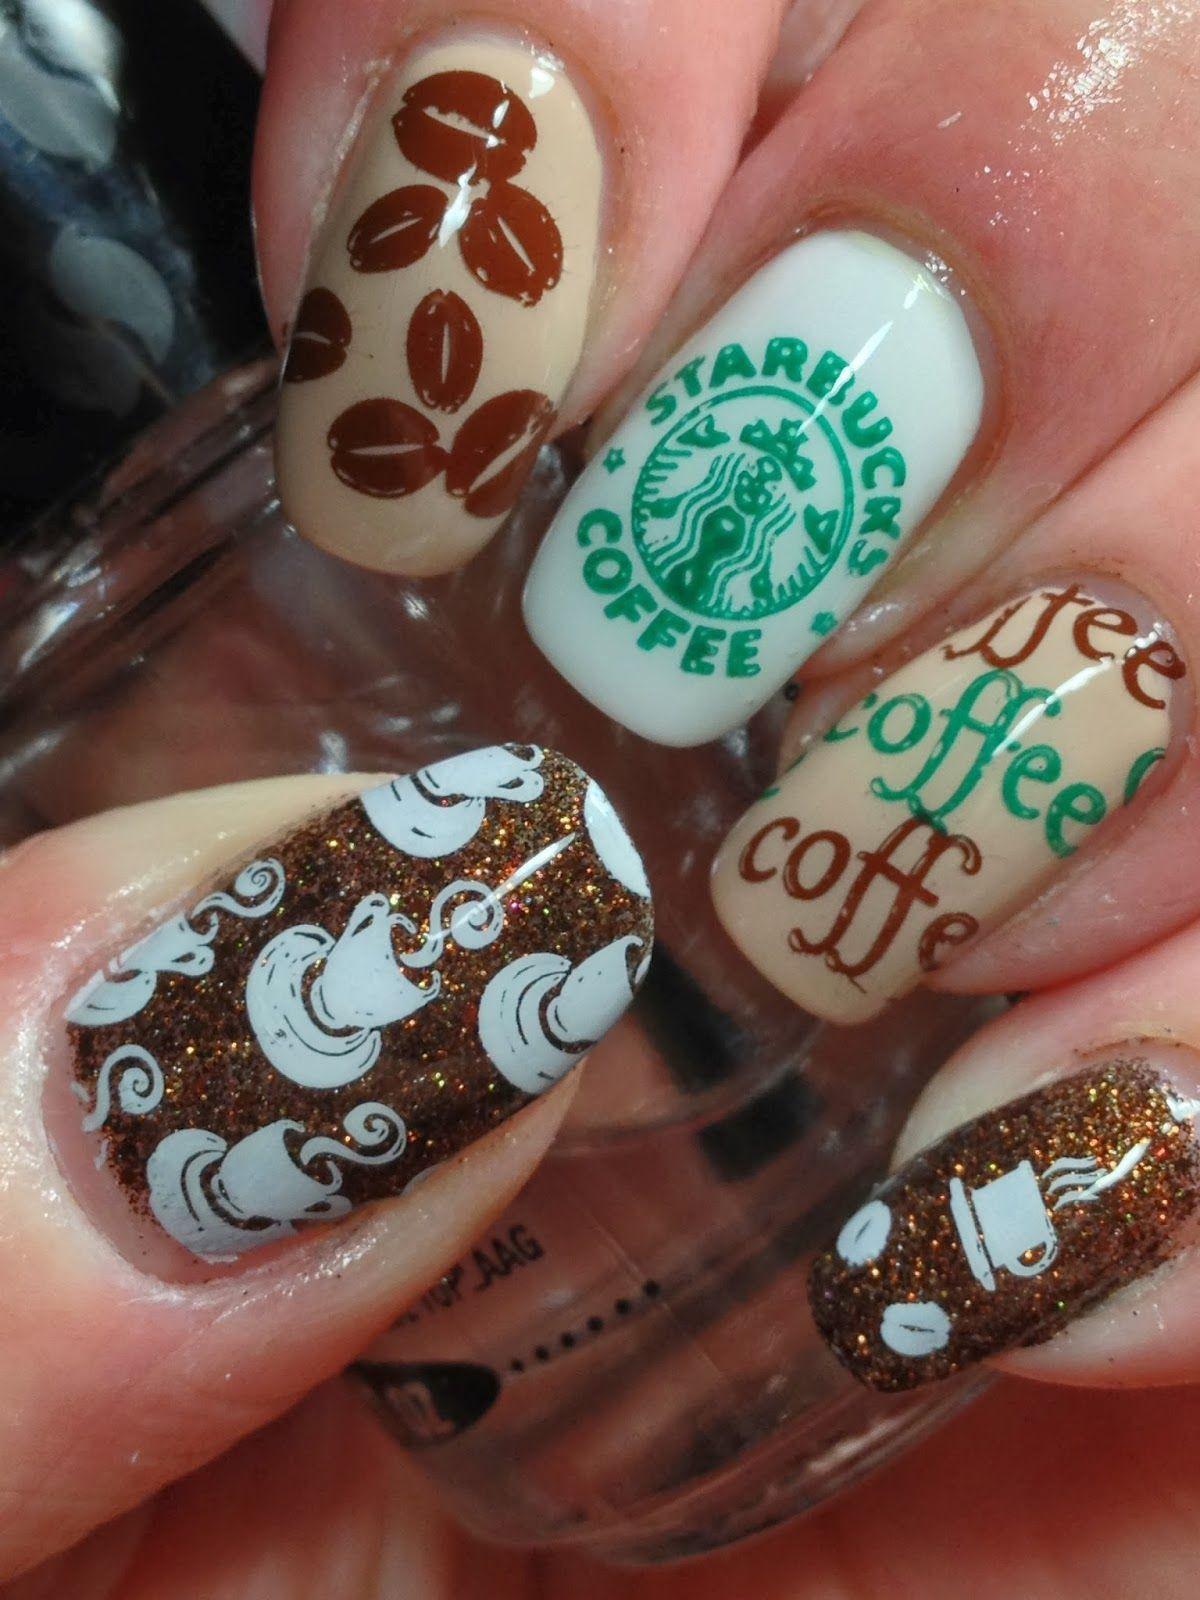 Starbucks Nail Art Nails In 2019 Nails Starbucks Nails